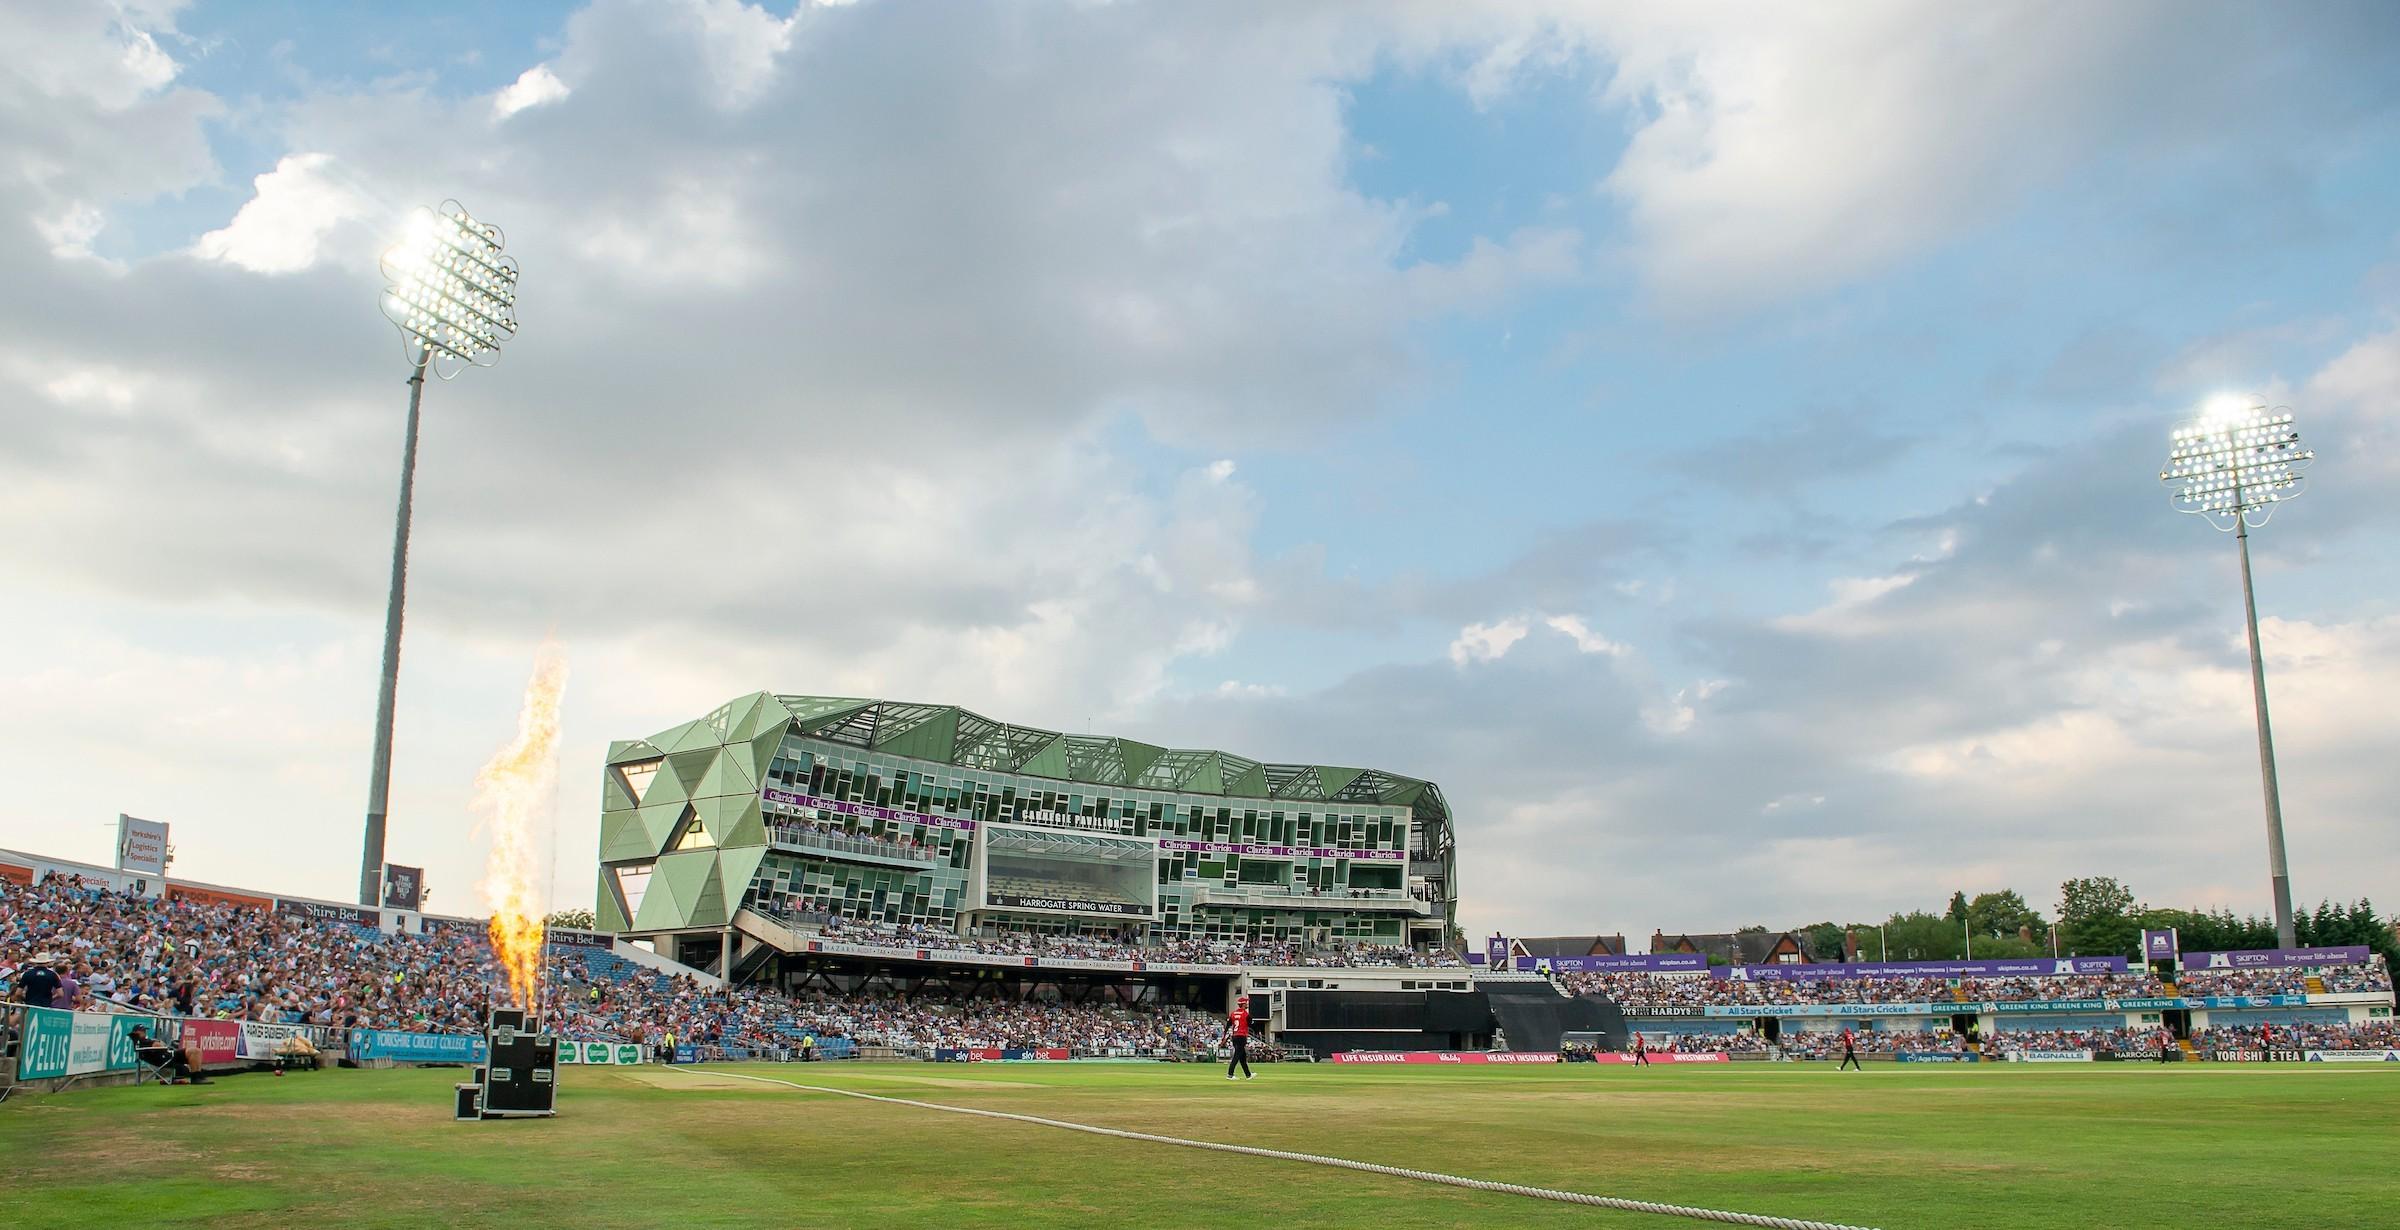 Headingley Cricket Ground Cricket World Cup 2019